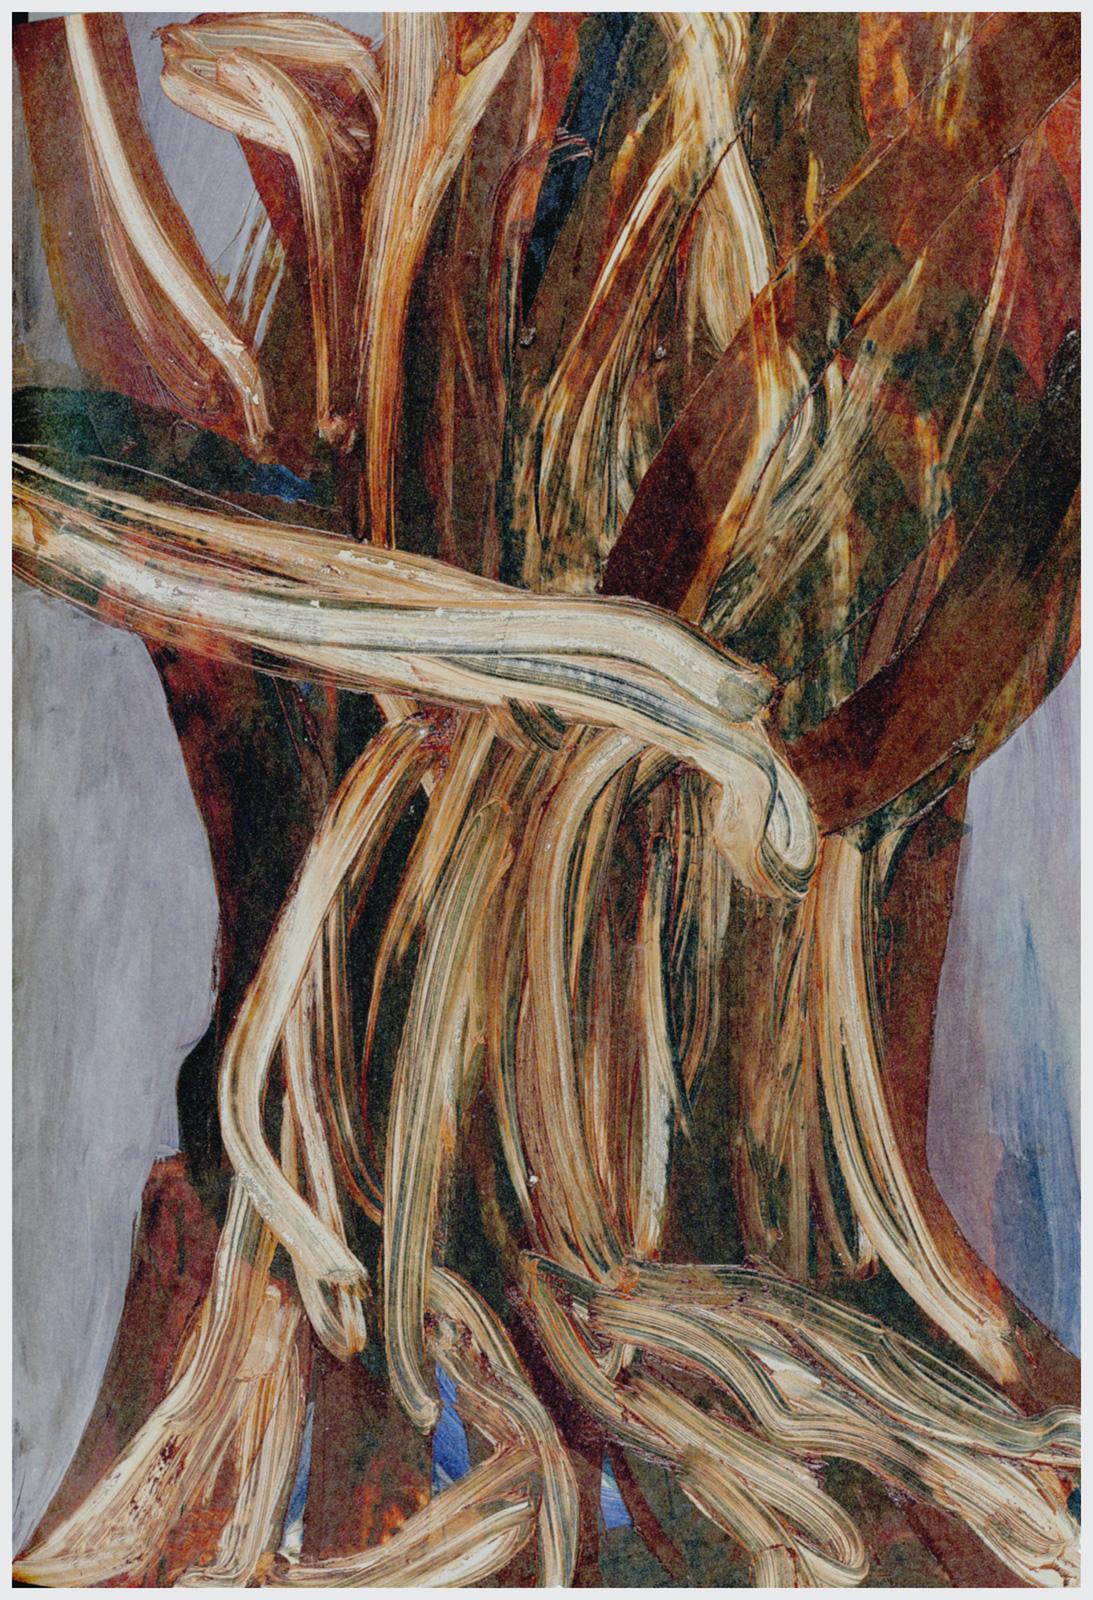 Ohne Titel, 2009, Öl auf Holz